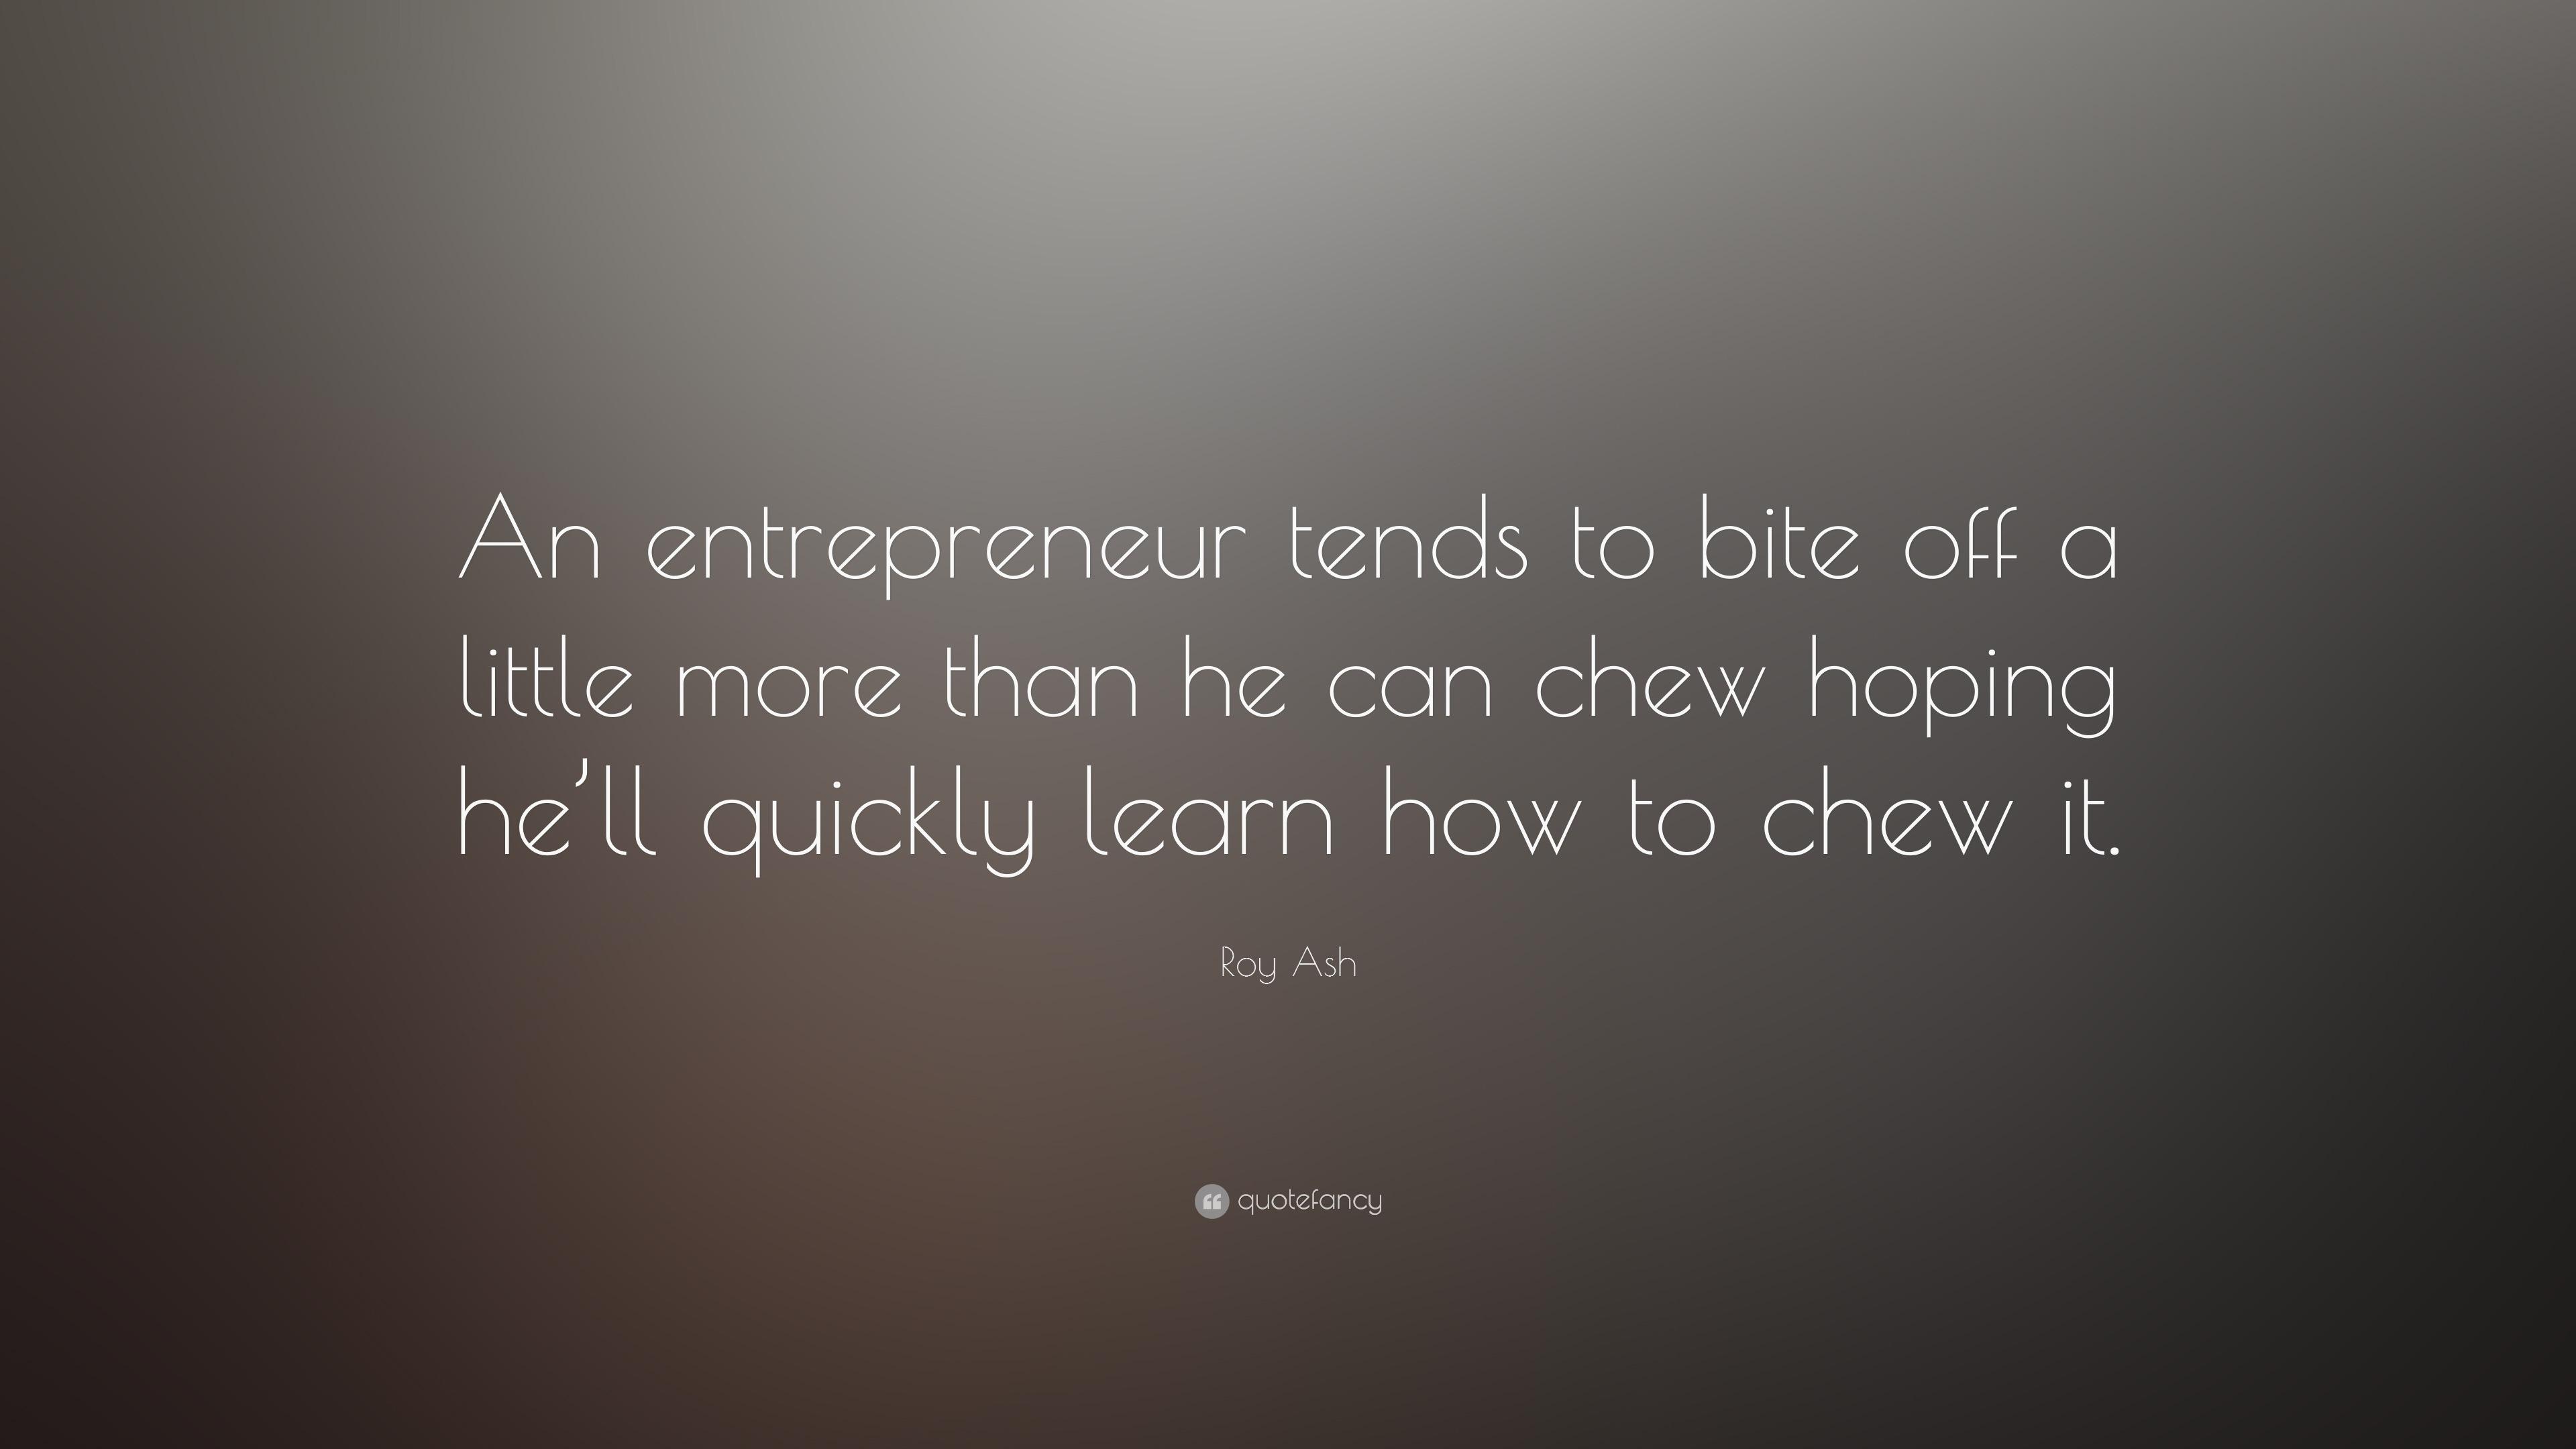 Steve Jobs Motivational Quotes Wallpaper Inspirational Entrepreneurship Quotes 69 Wallpapers